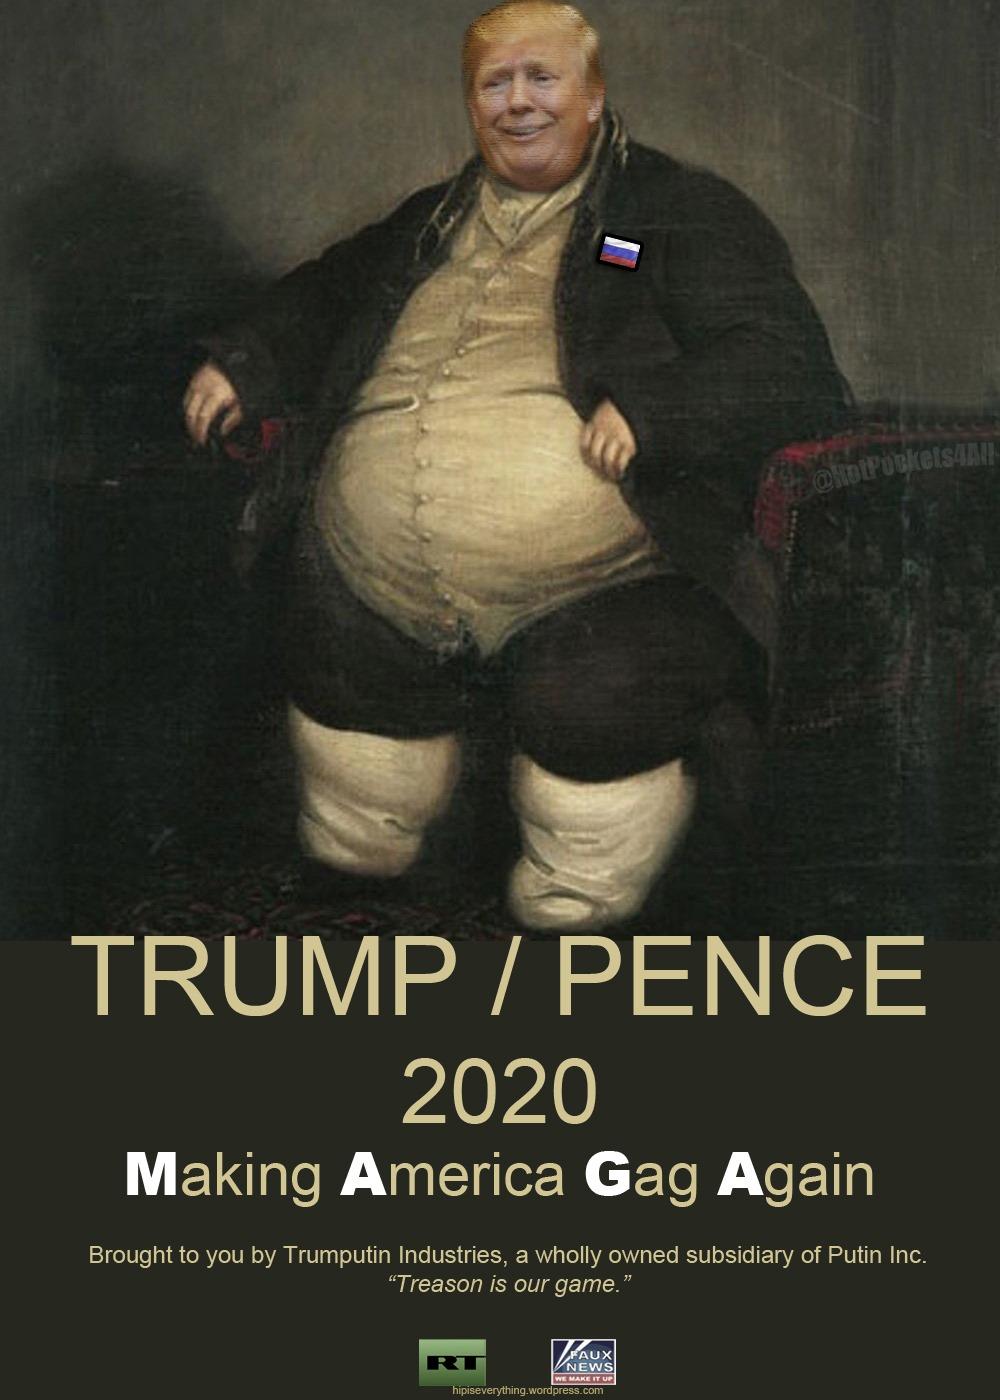 trump pence 2020 MAGAt